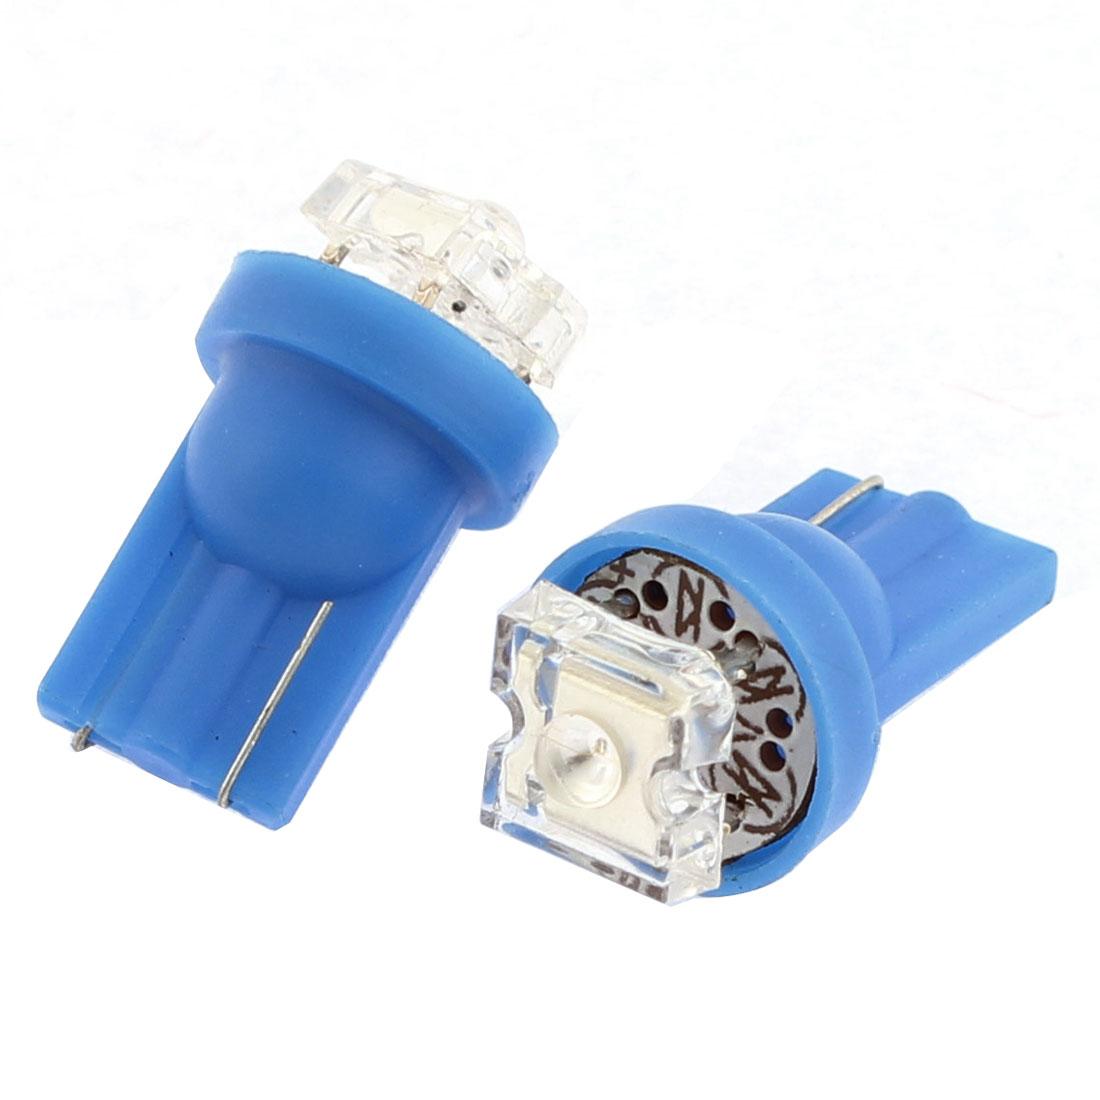 6 Pcs T10 Blue LED 168 194 W5W Backup Map Light Bulb Lamp DC 12V